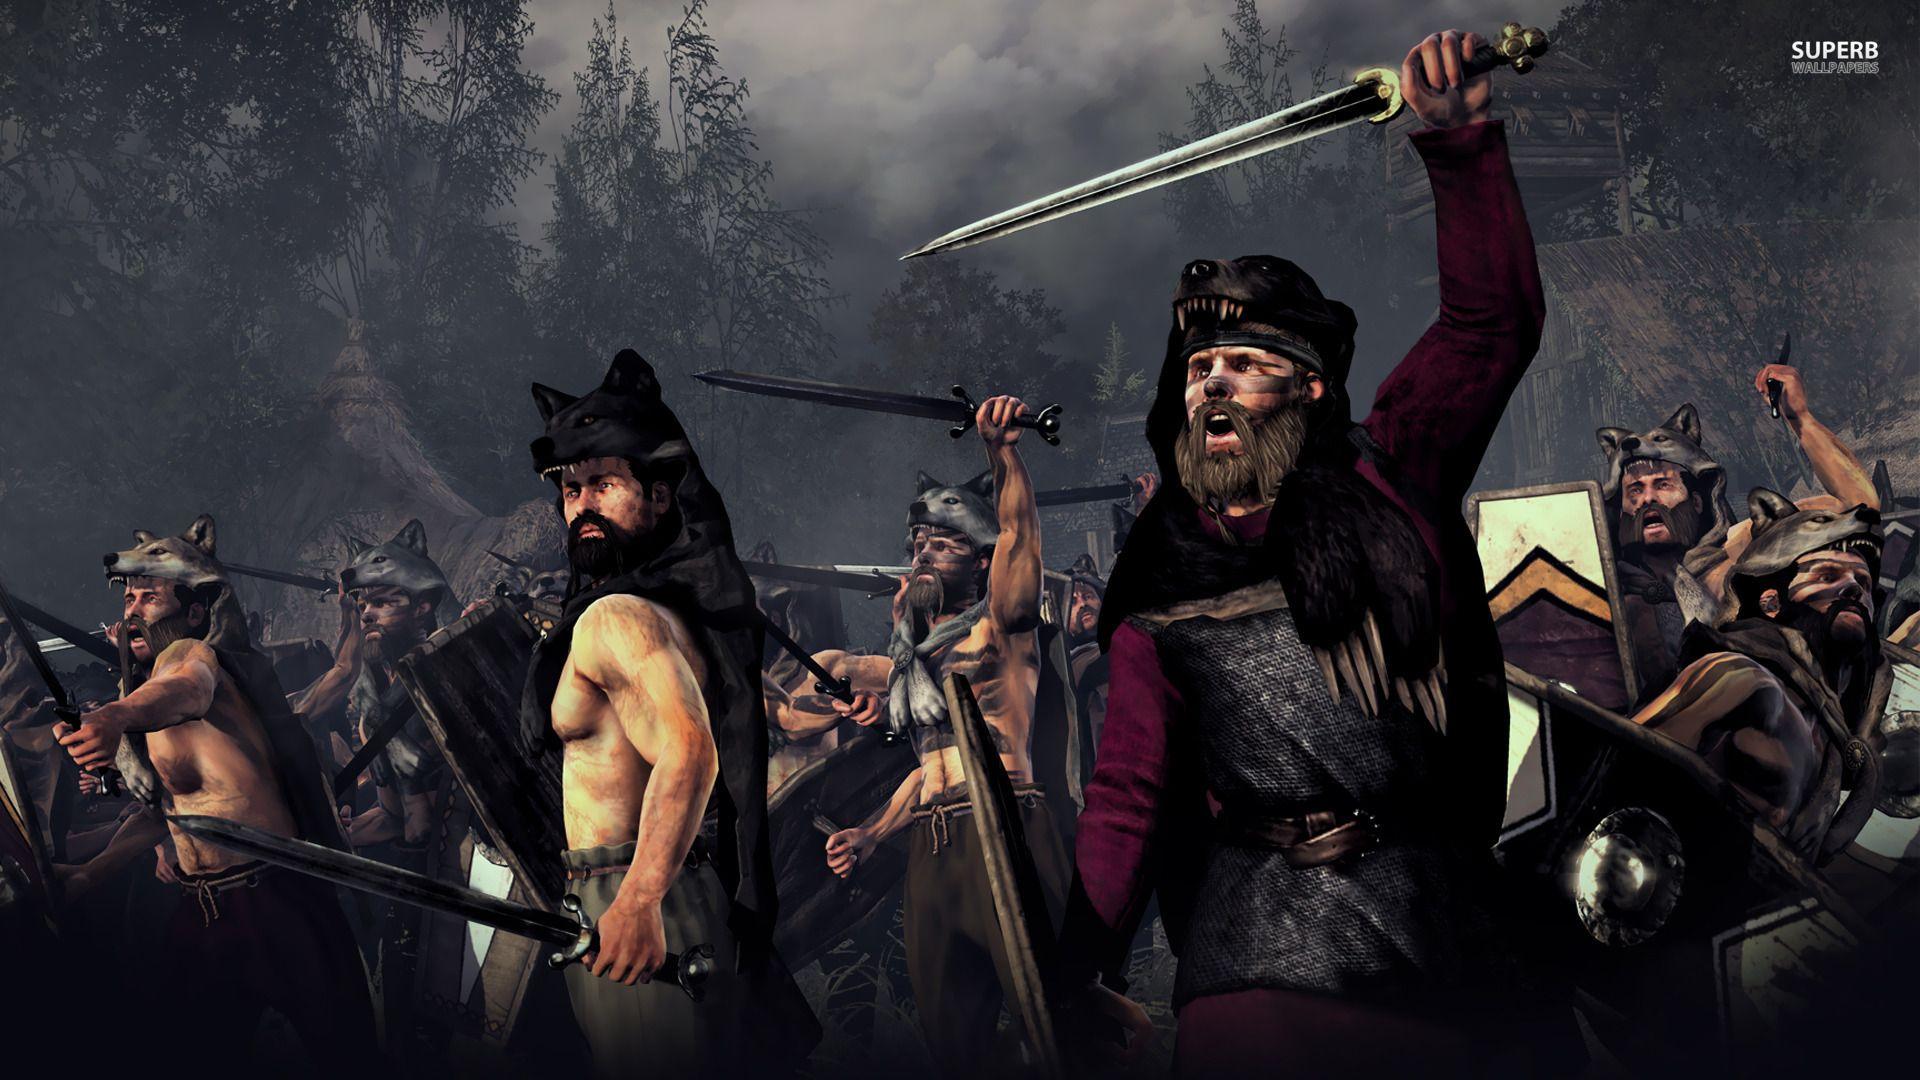 Call Of Duty Black Ops 3 Title HD desktop wallpaper : Widescreen ...